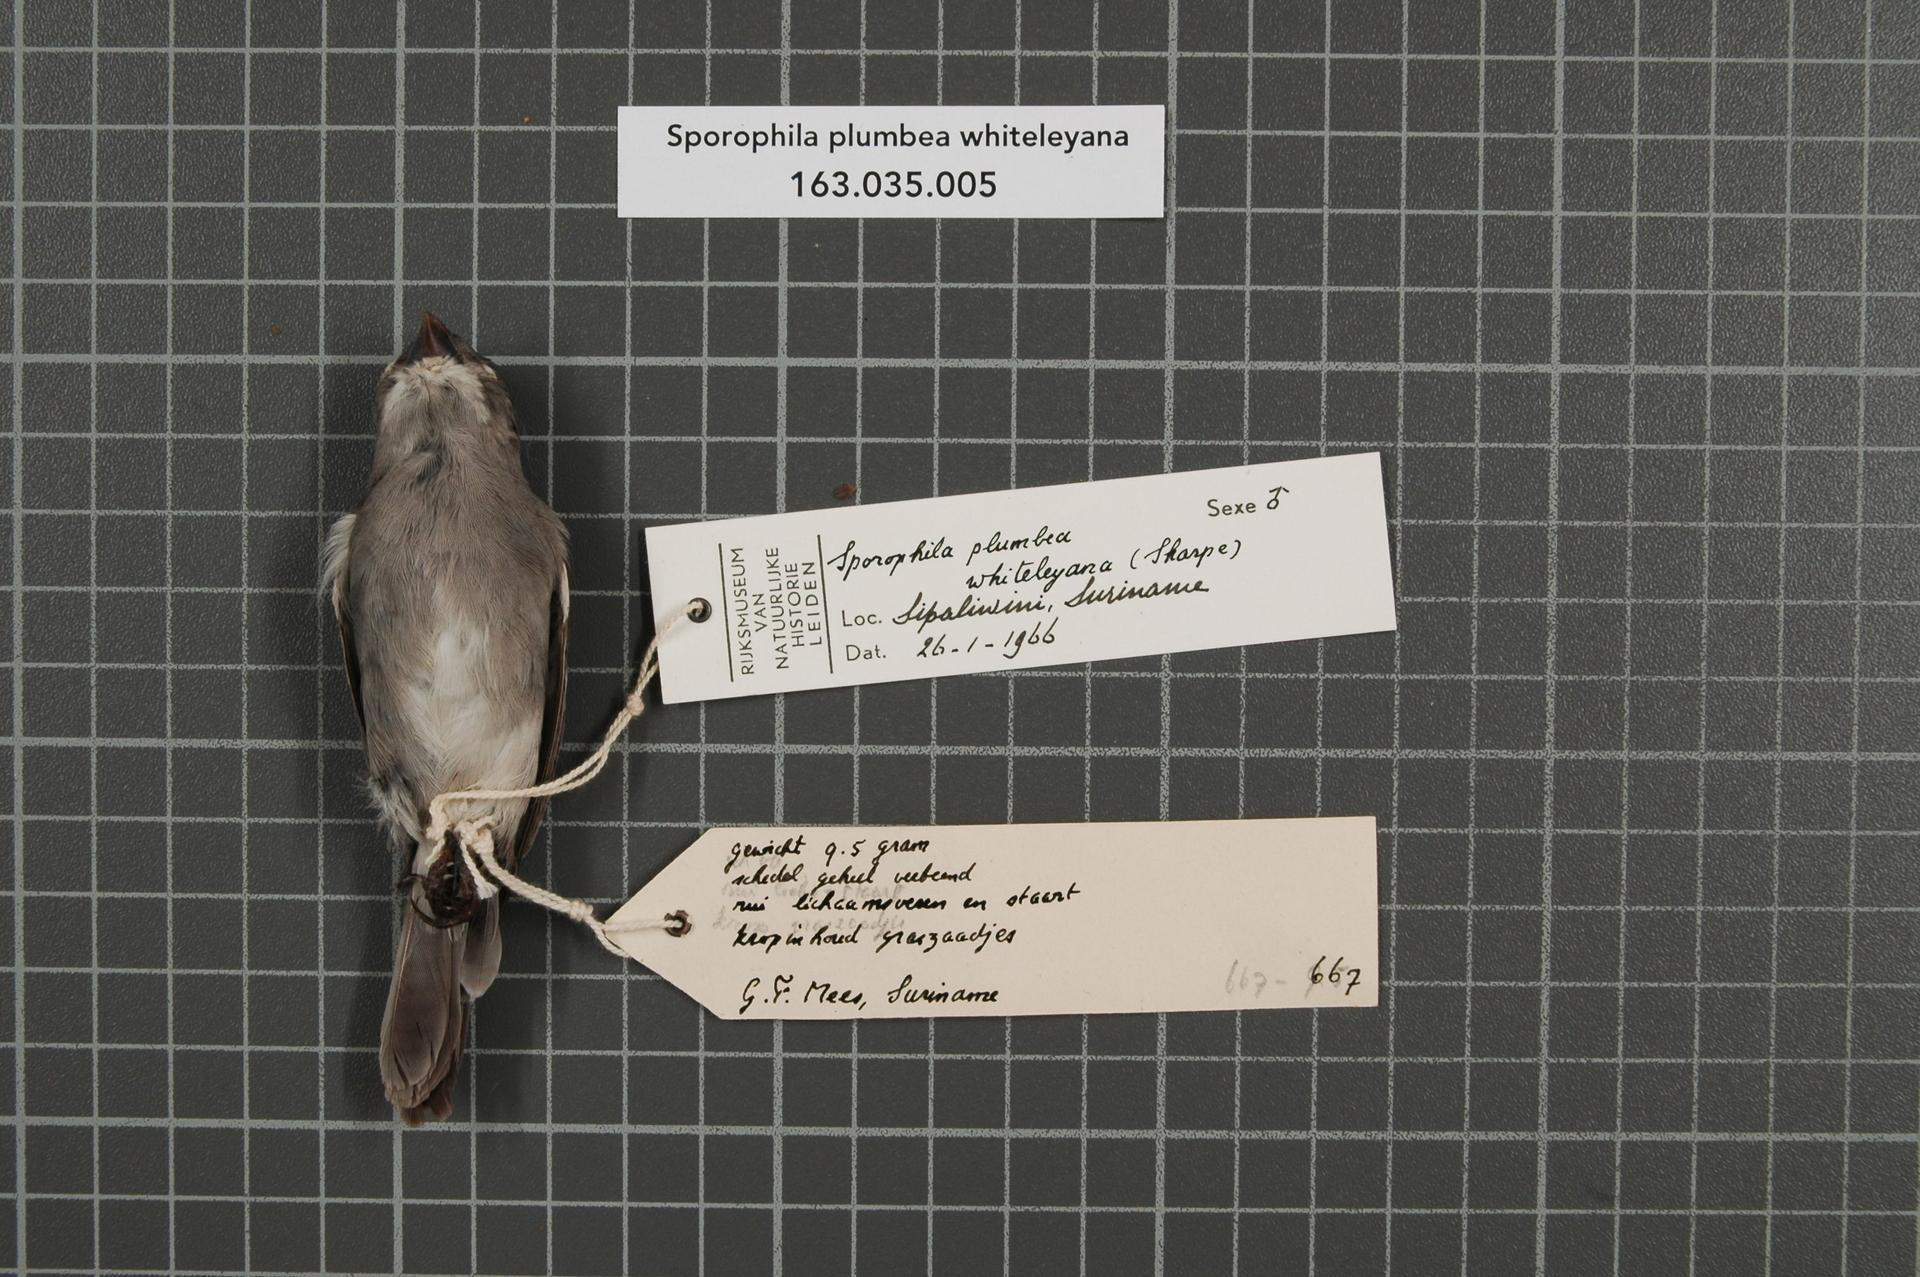 RMNH.AVES.39211   Sporophila plumbea whiteleyana (Sharpe, 1888)